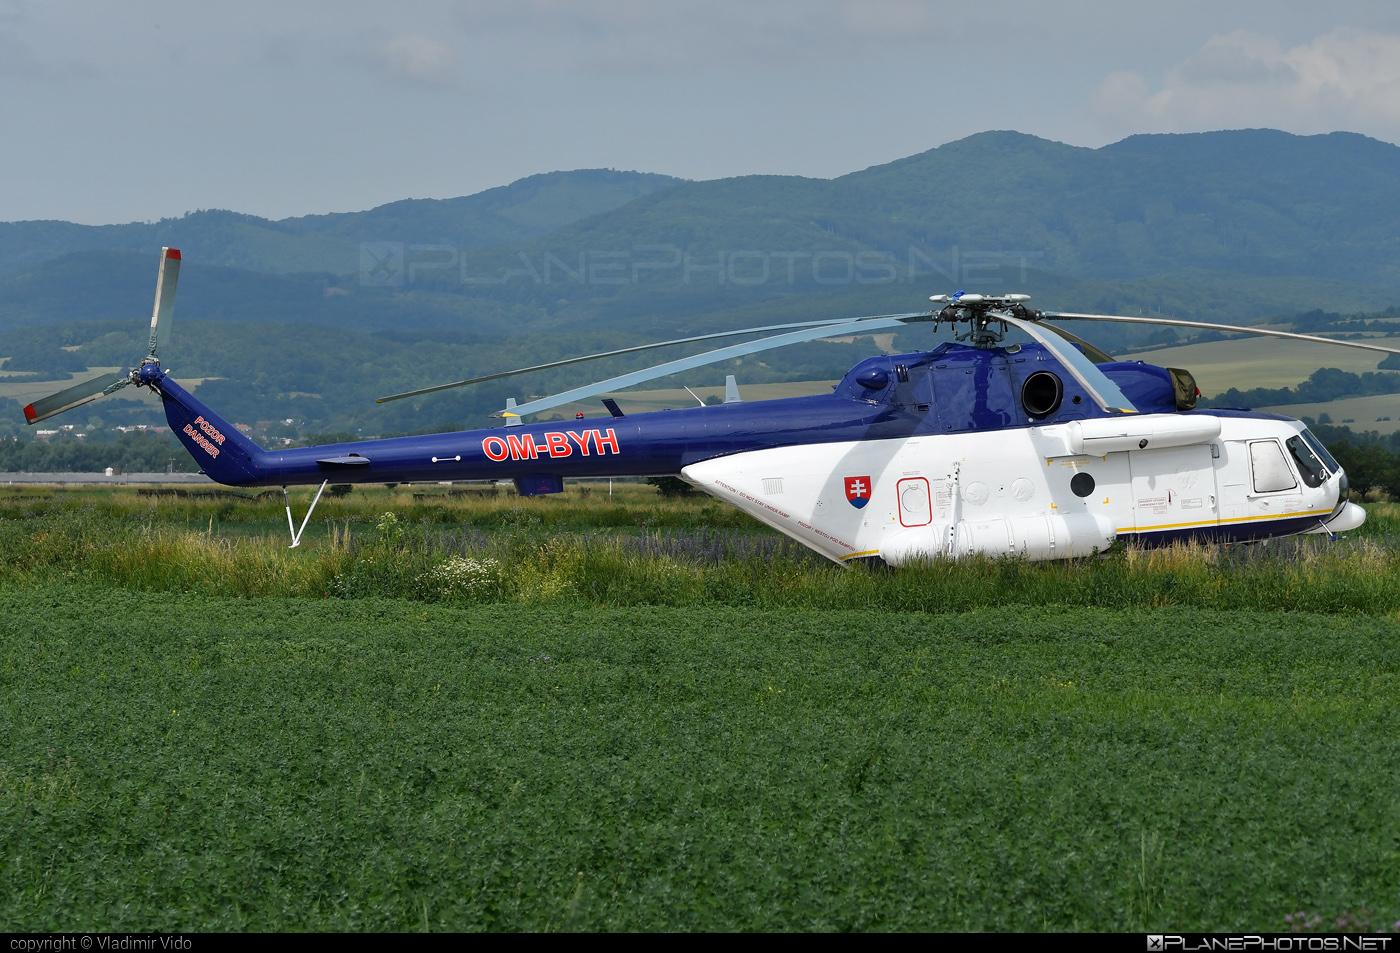 Mil Mi-171 - OM-BYH operated by Letecký útvar MV SR (Slovak Government Flying Service) #mi171 #mil #mil171 #milhelicopters